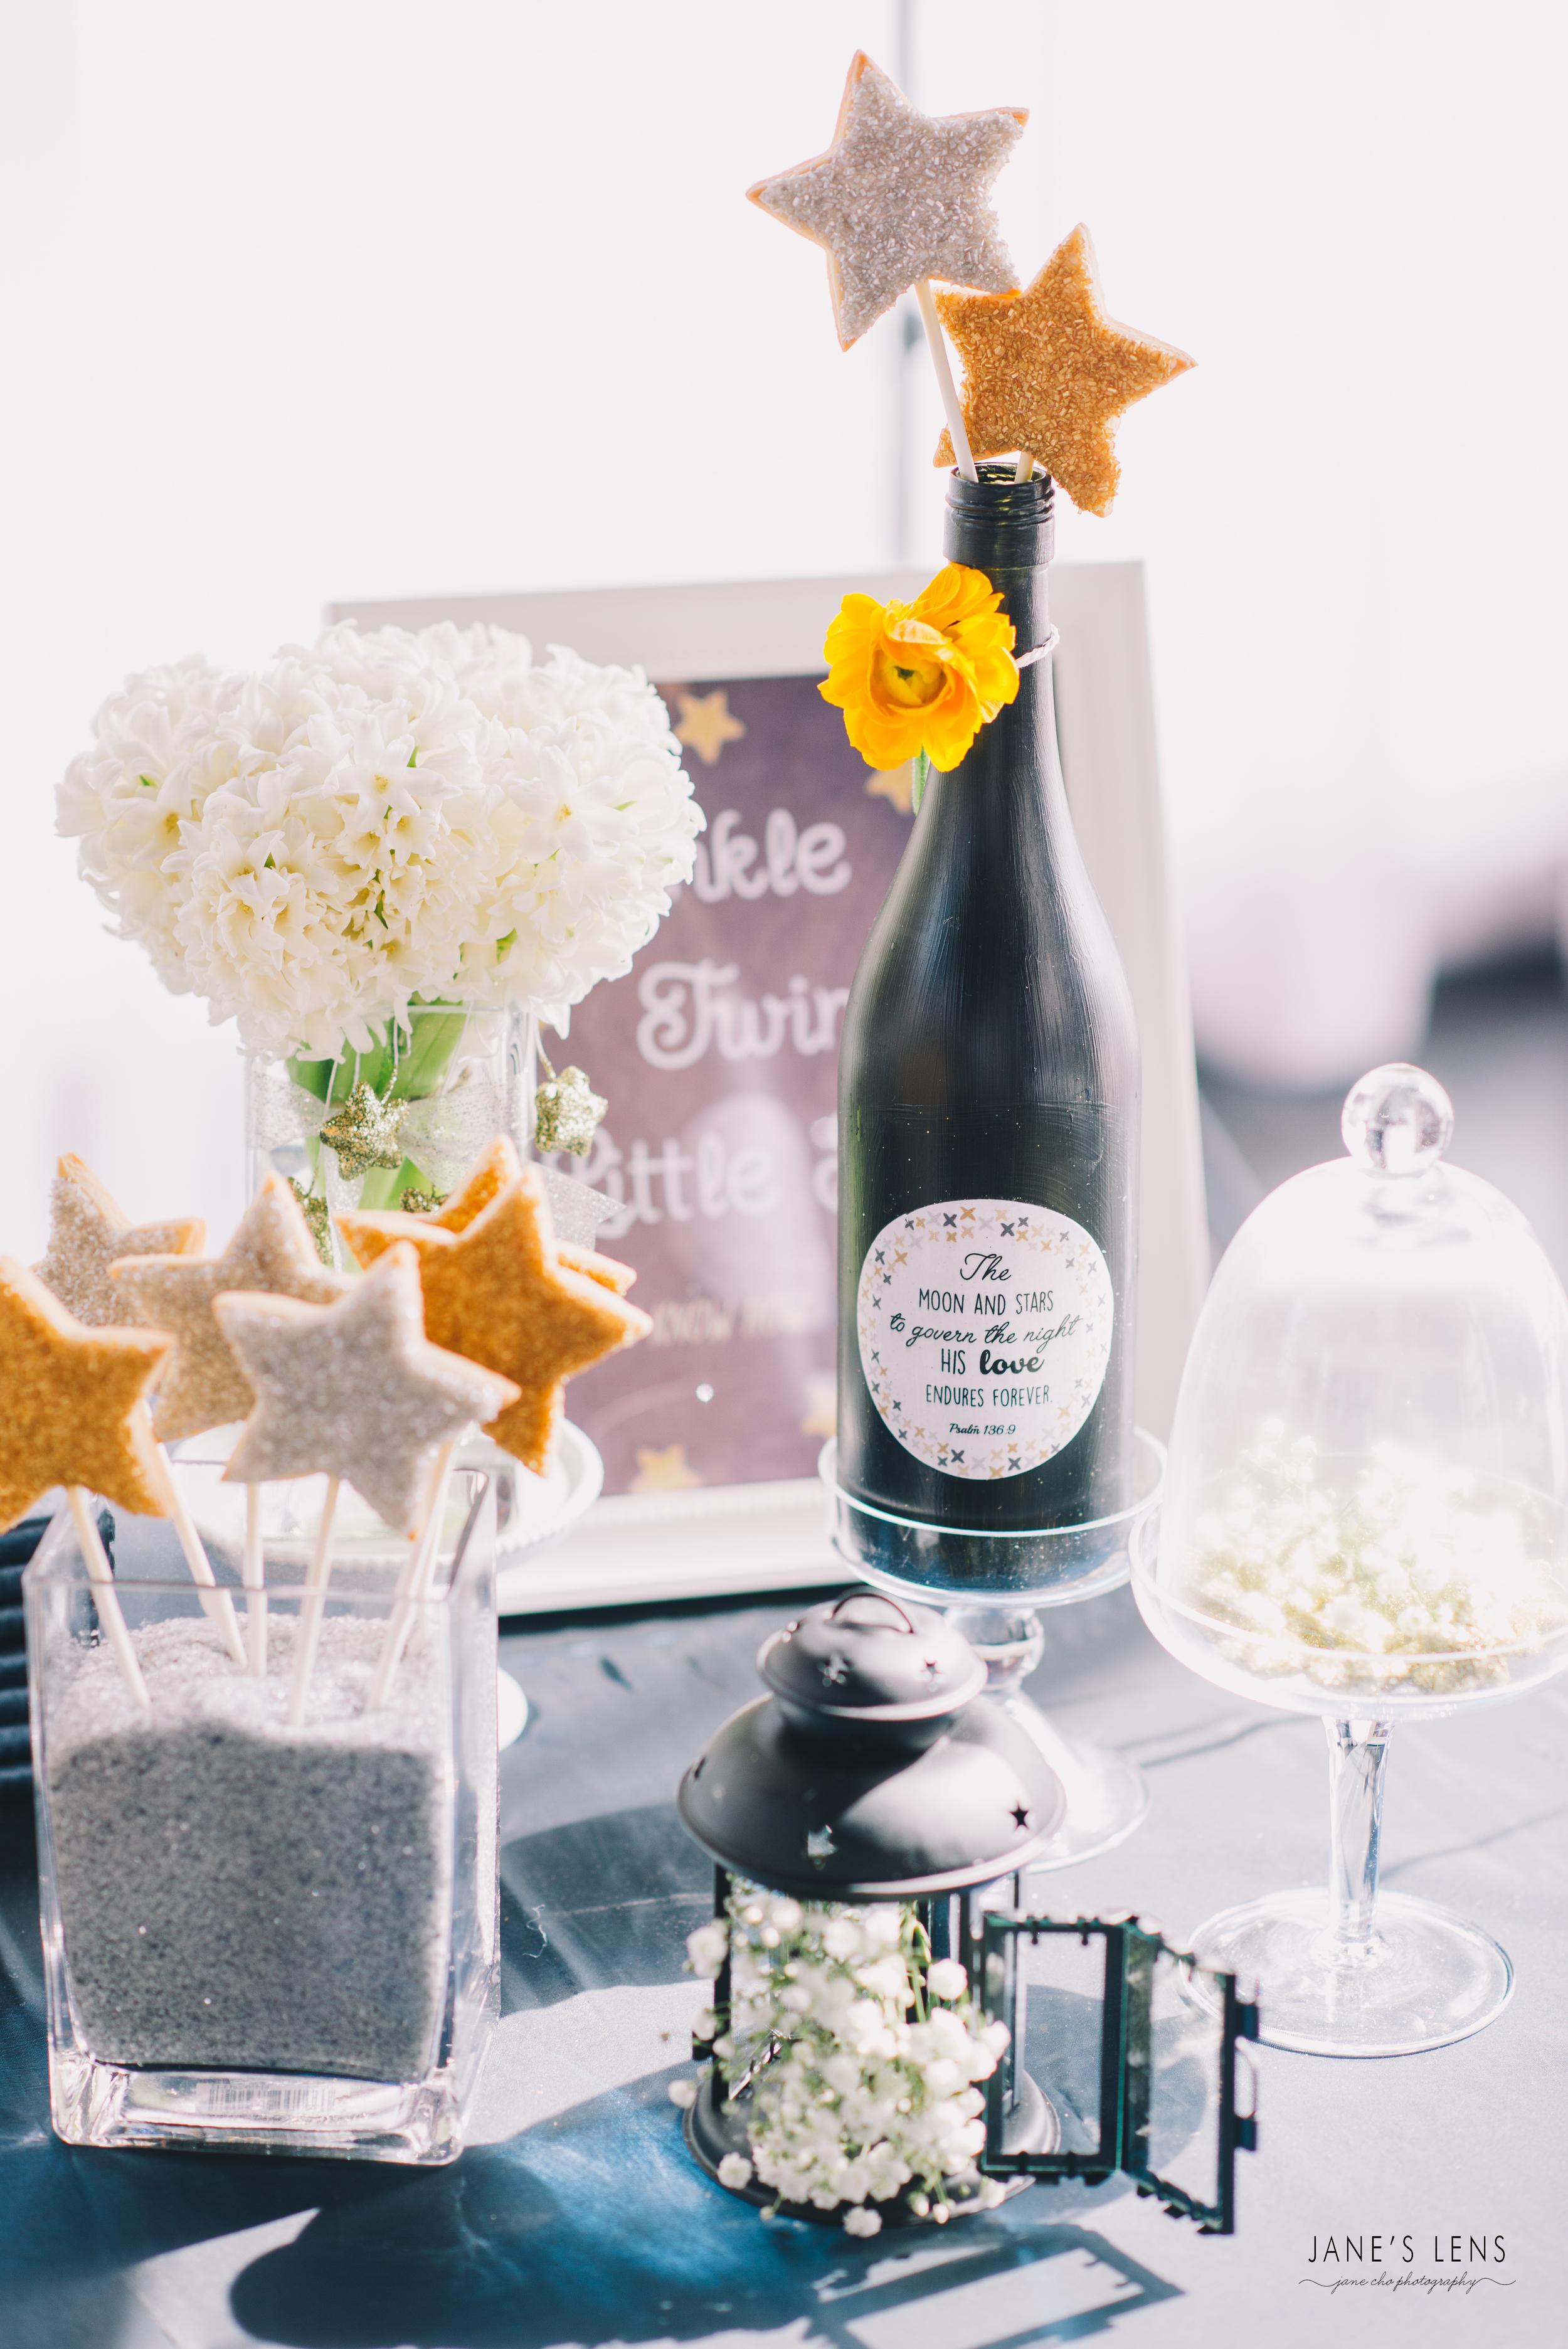 Twinkle Twinkle Little Star Dohl Dohlsang Sugar Cookies Jennifer Choi Desserts doljanchi.jpg